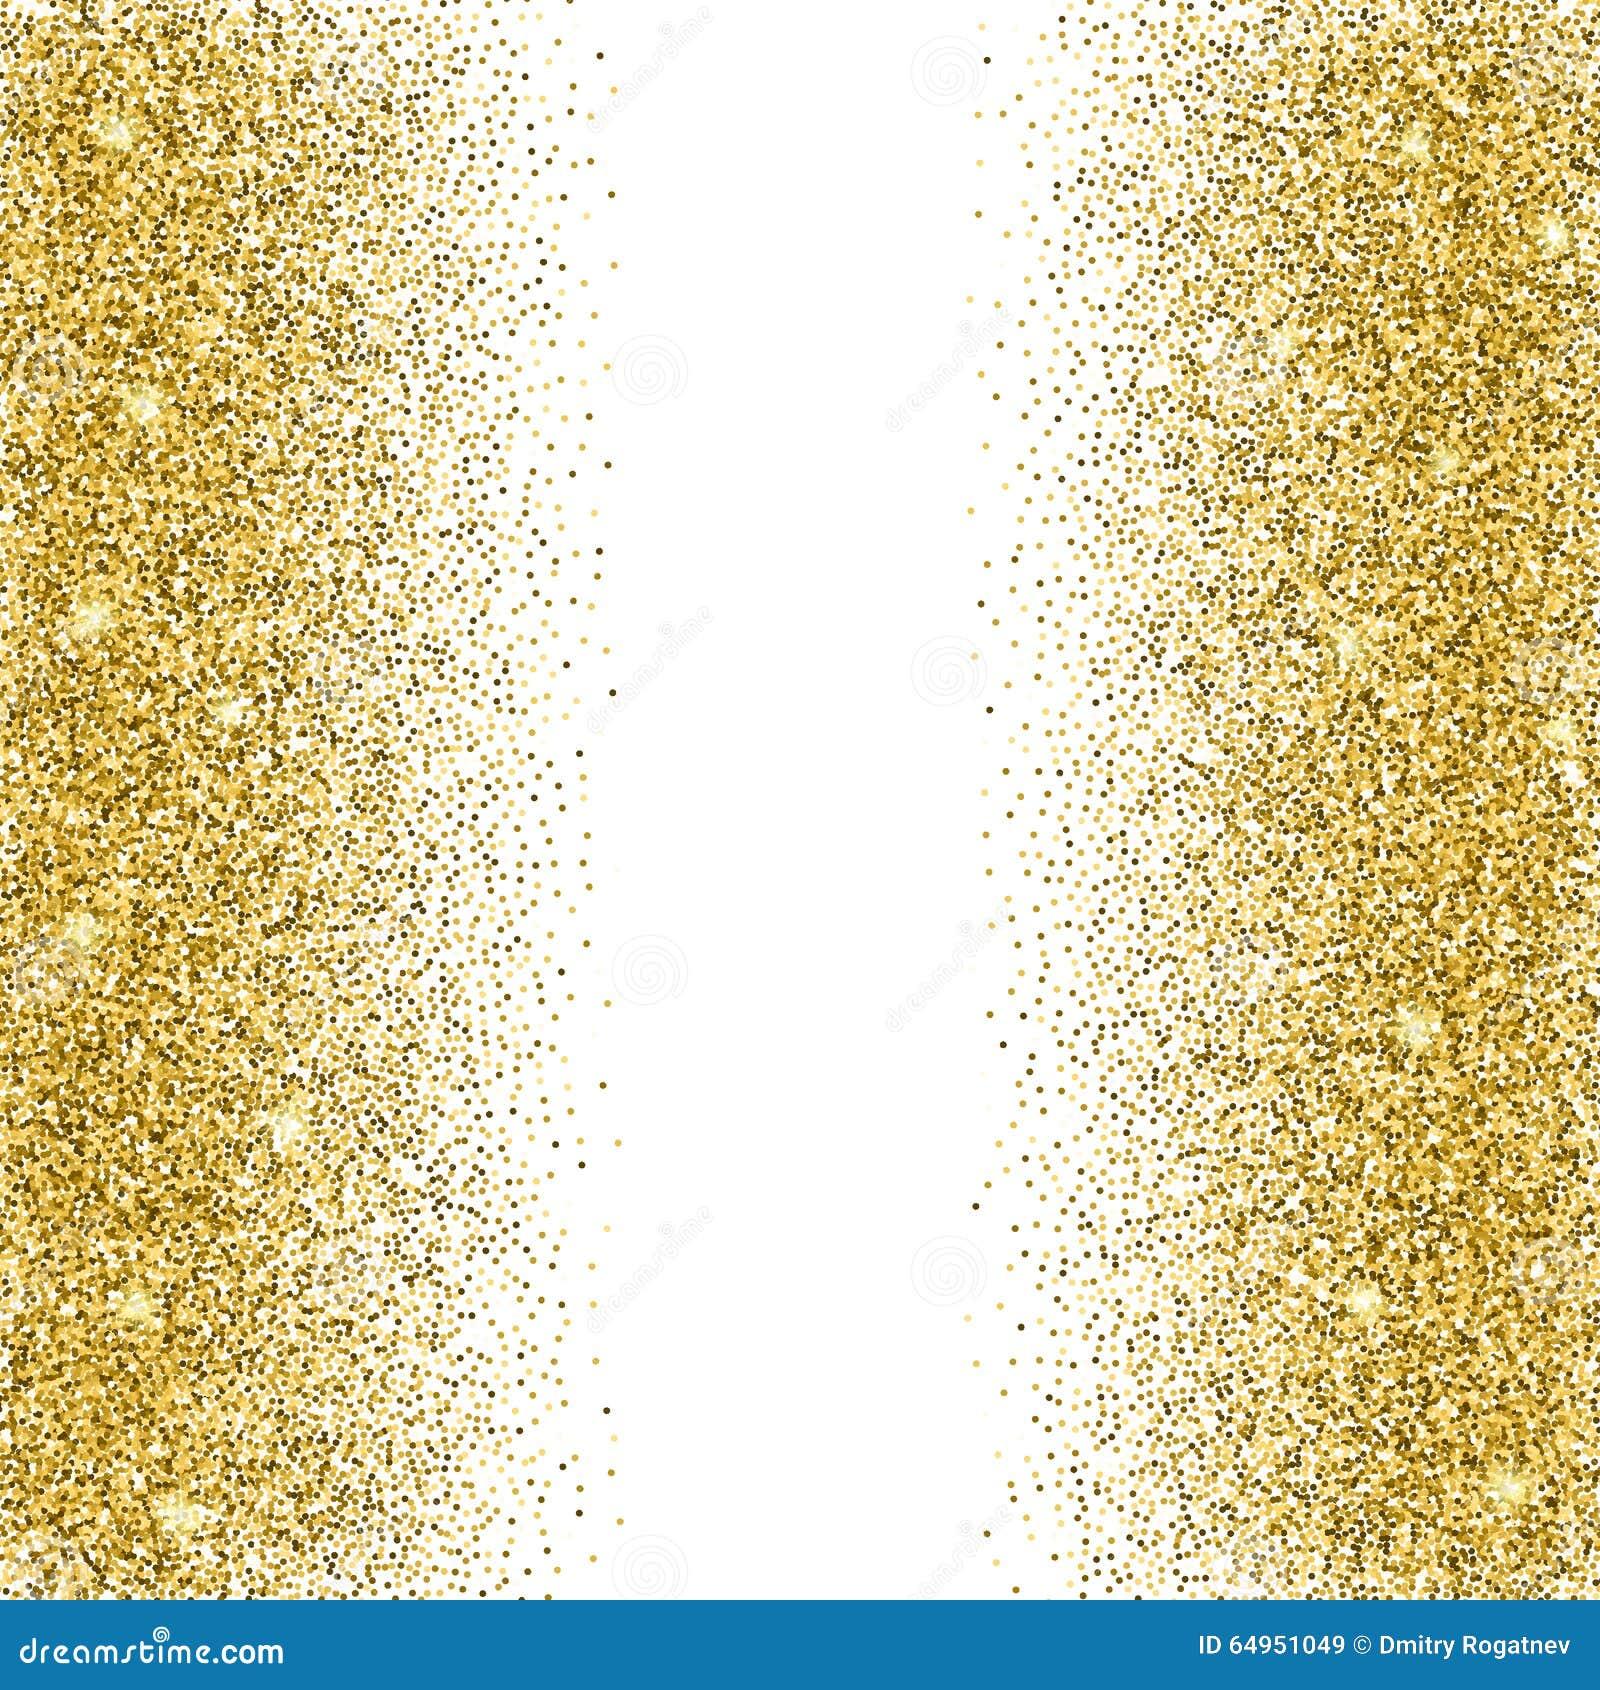 Gold Glitter Background. Stock Vector - Image: 64951049